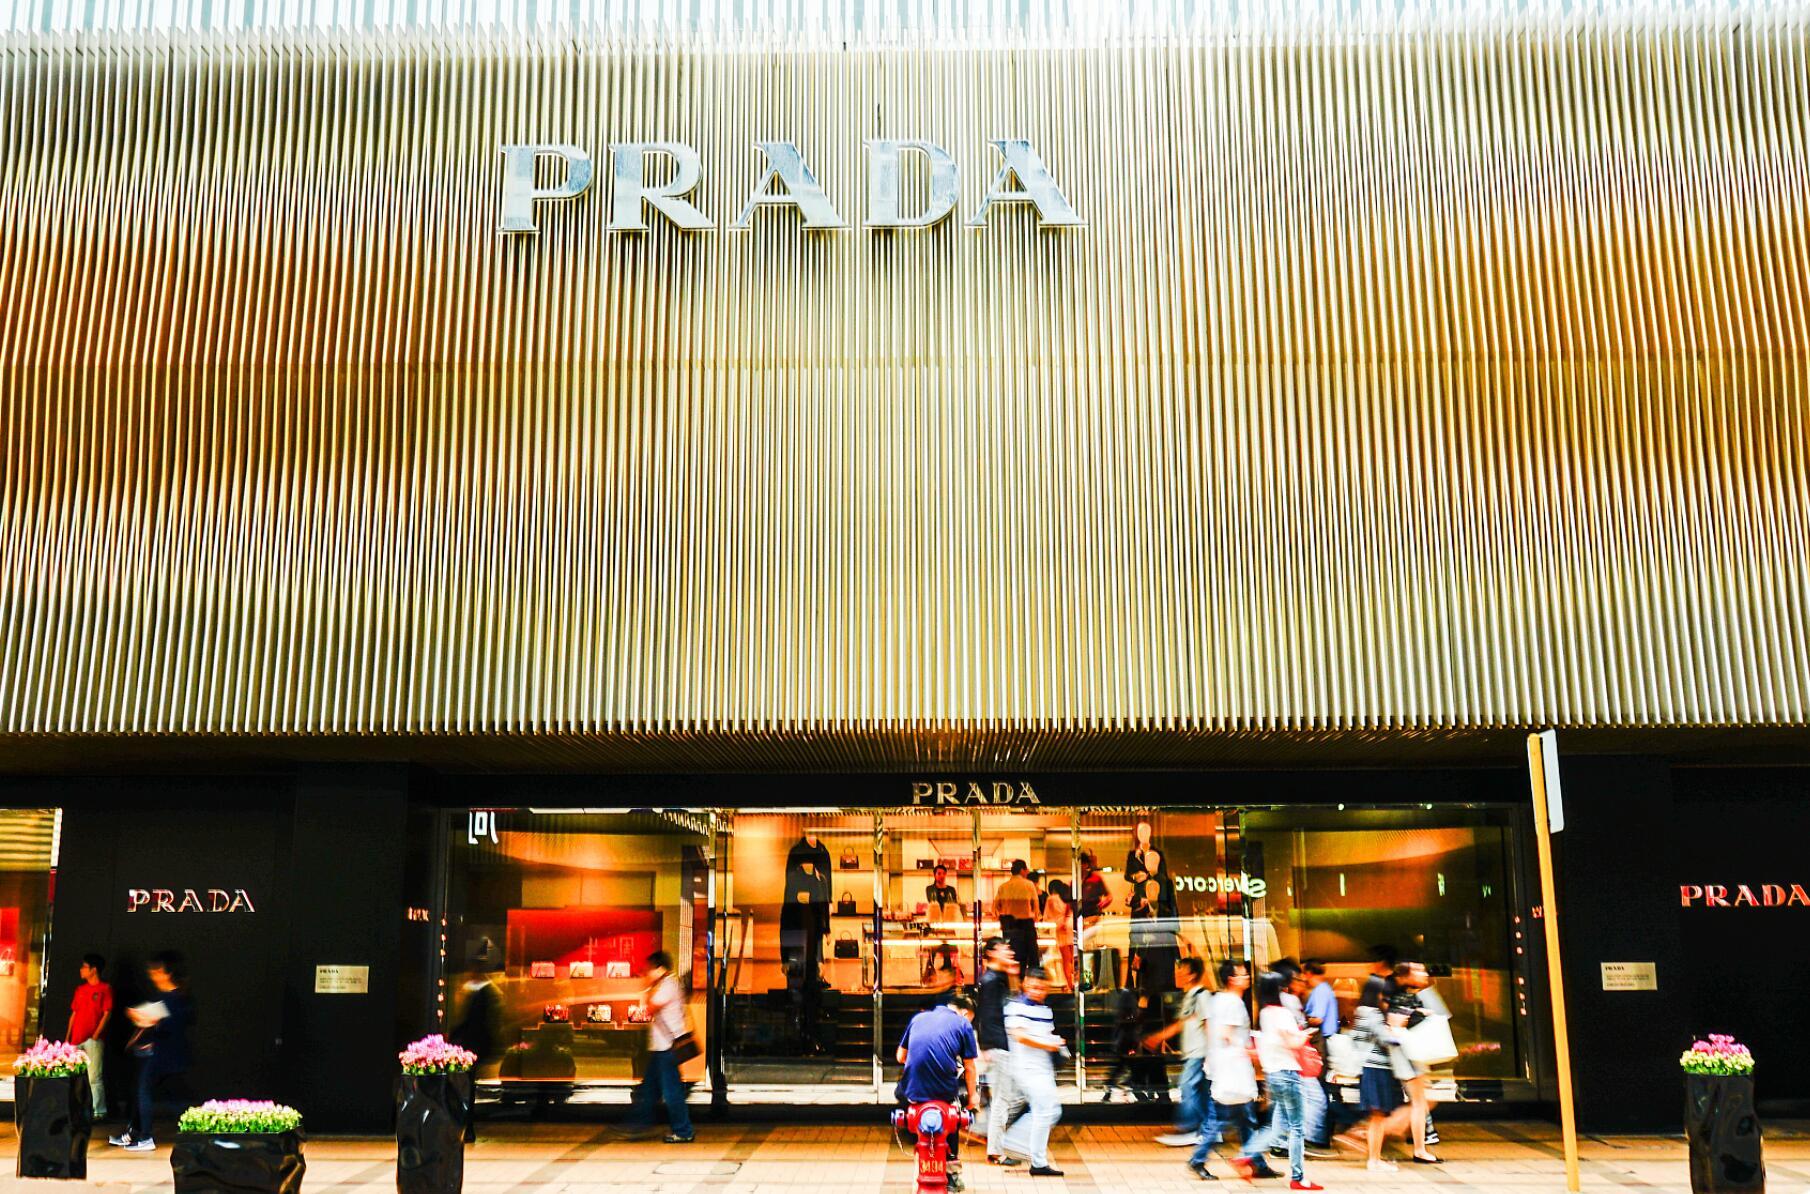 Prada 最大一家香港门店明年租约到期或将闭店,月租金高达900万港币